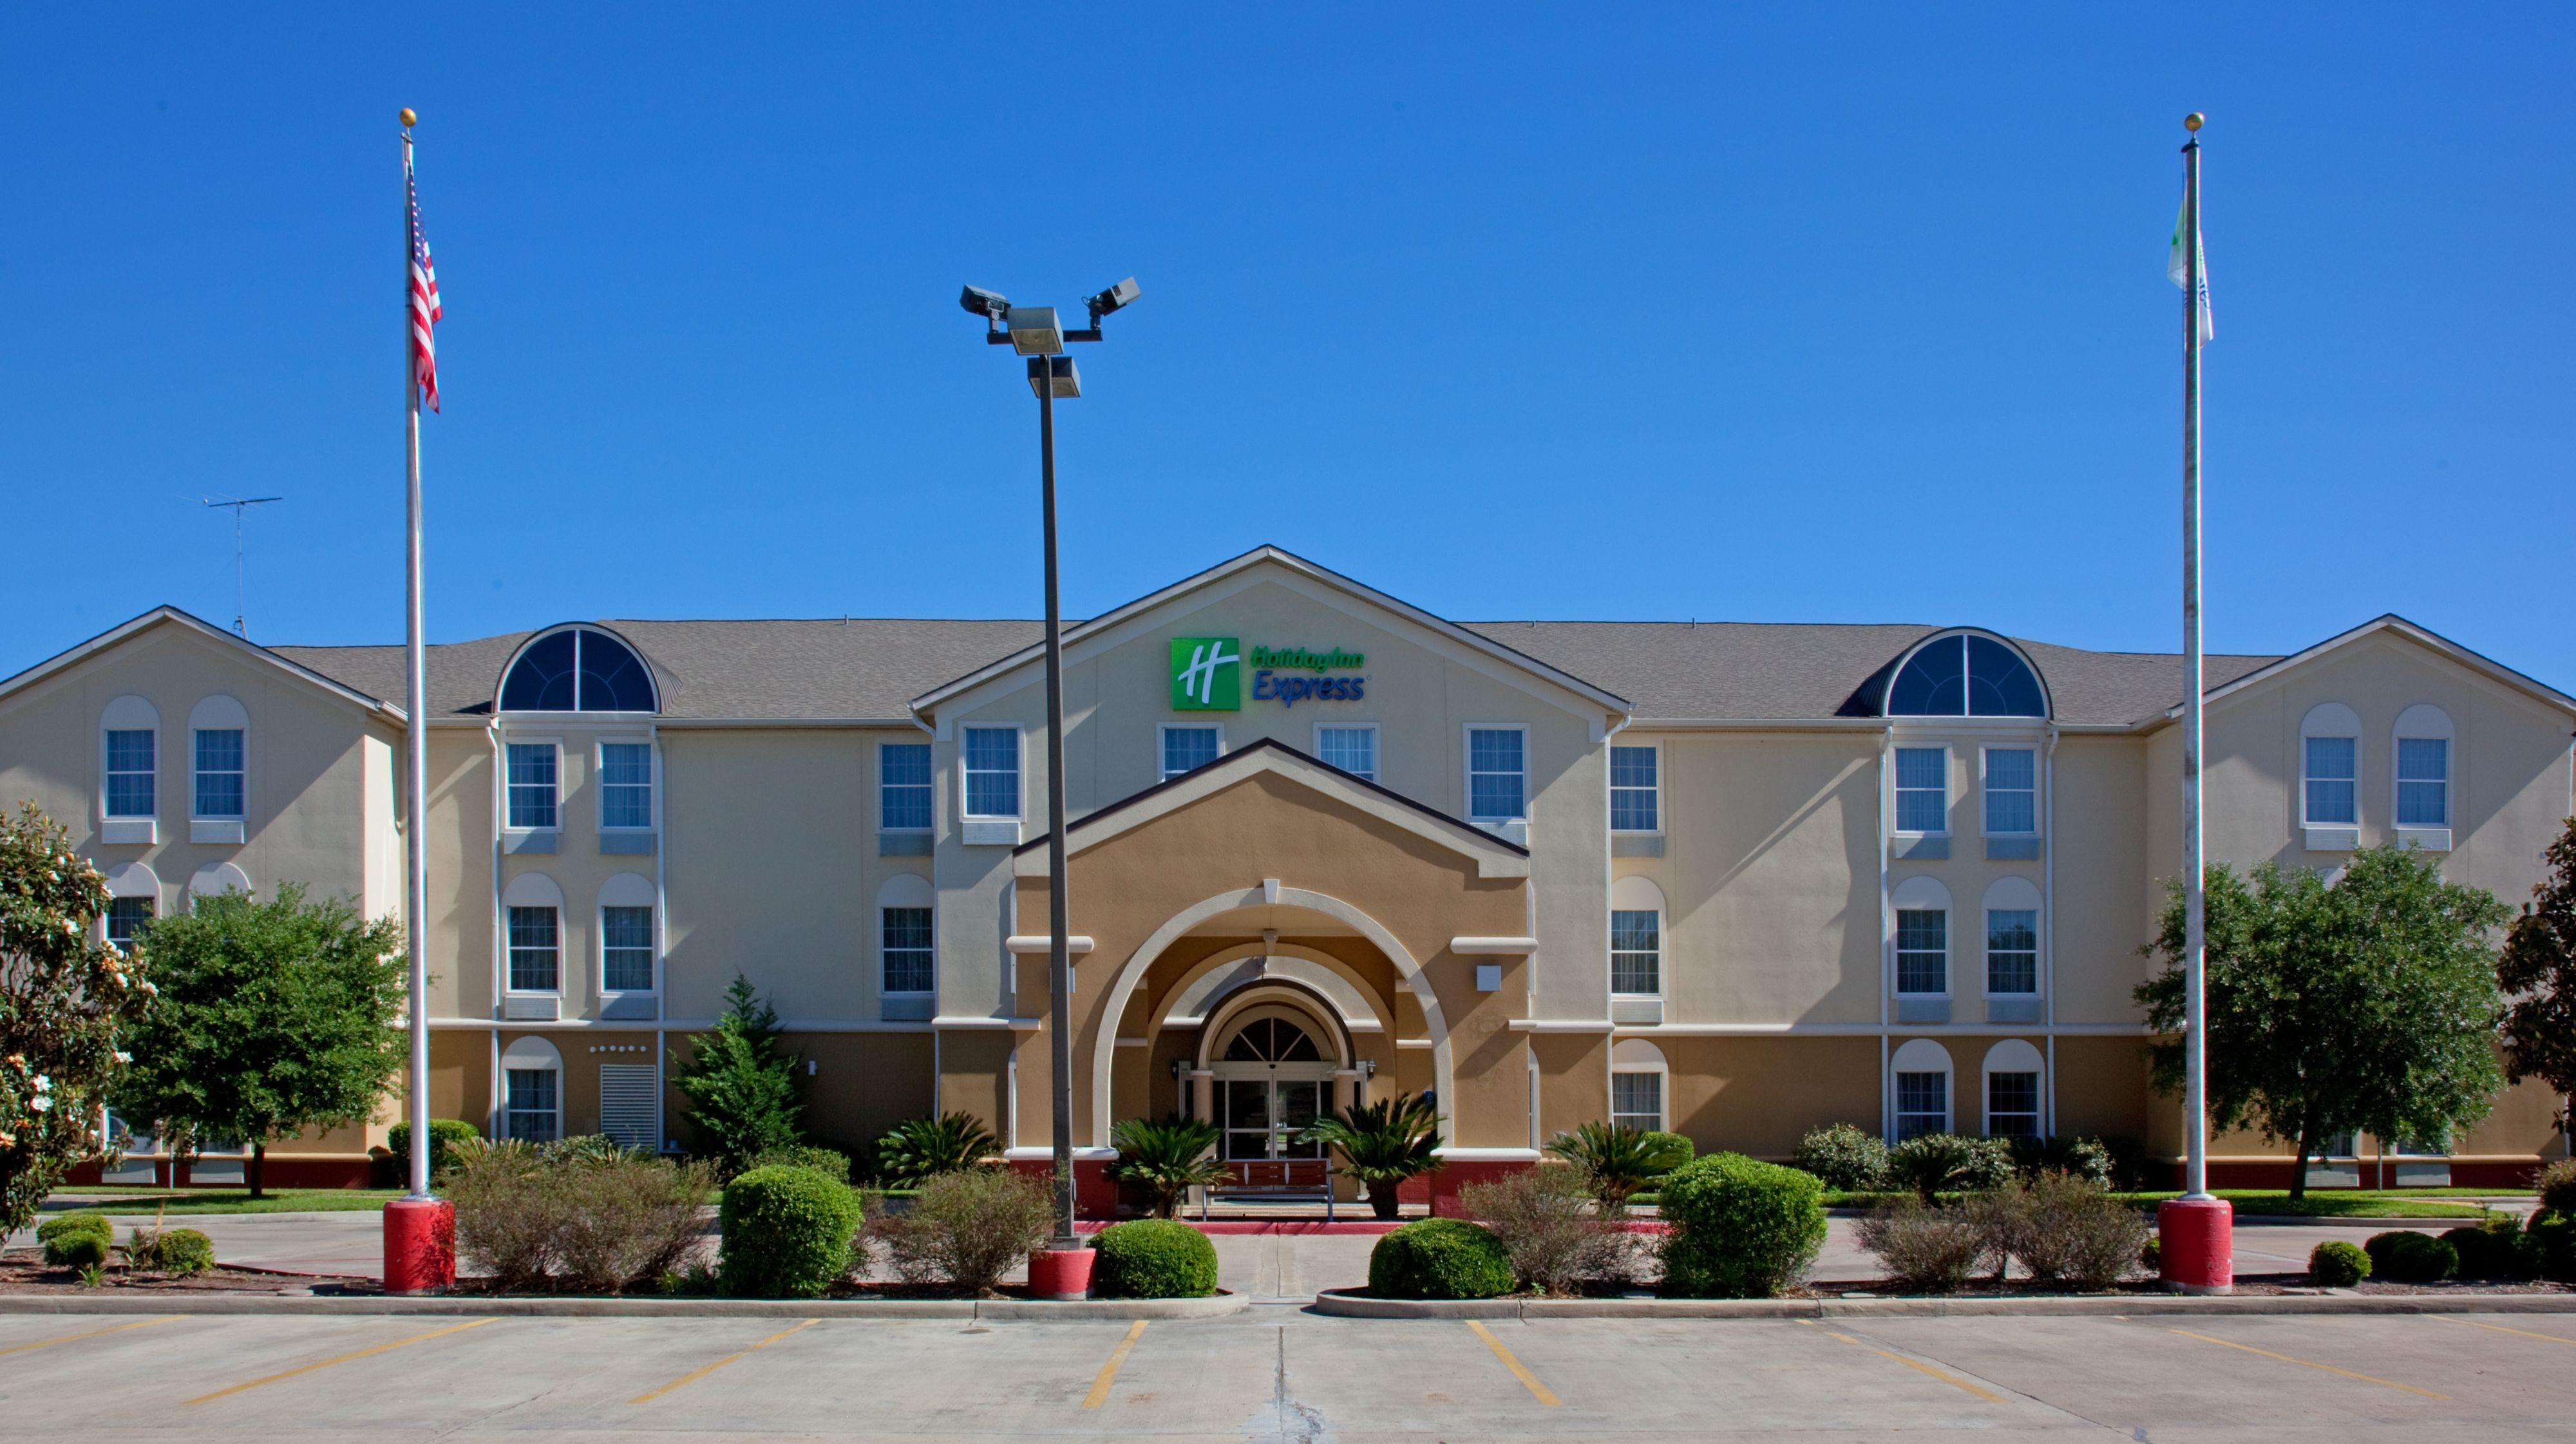 Holiday Inn Express Suites Columbia I 26 Harbison Blvd Columbia South Carolina Sc